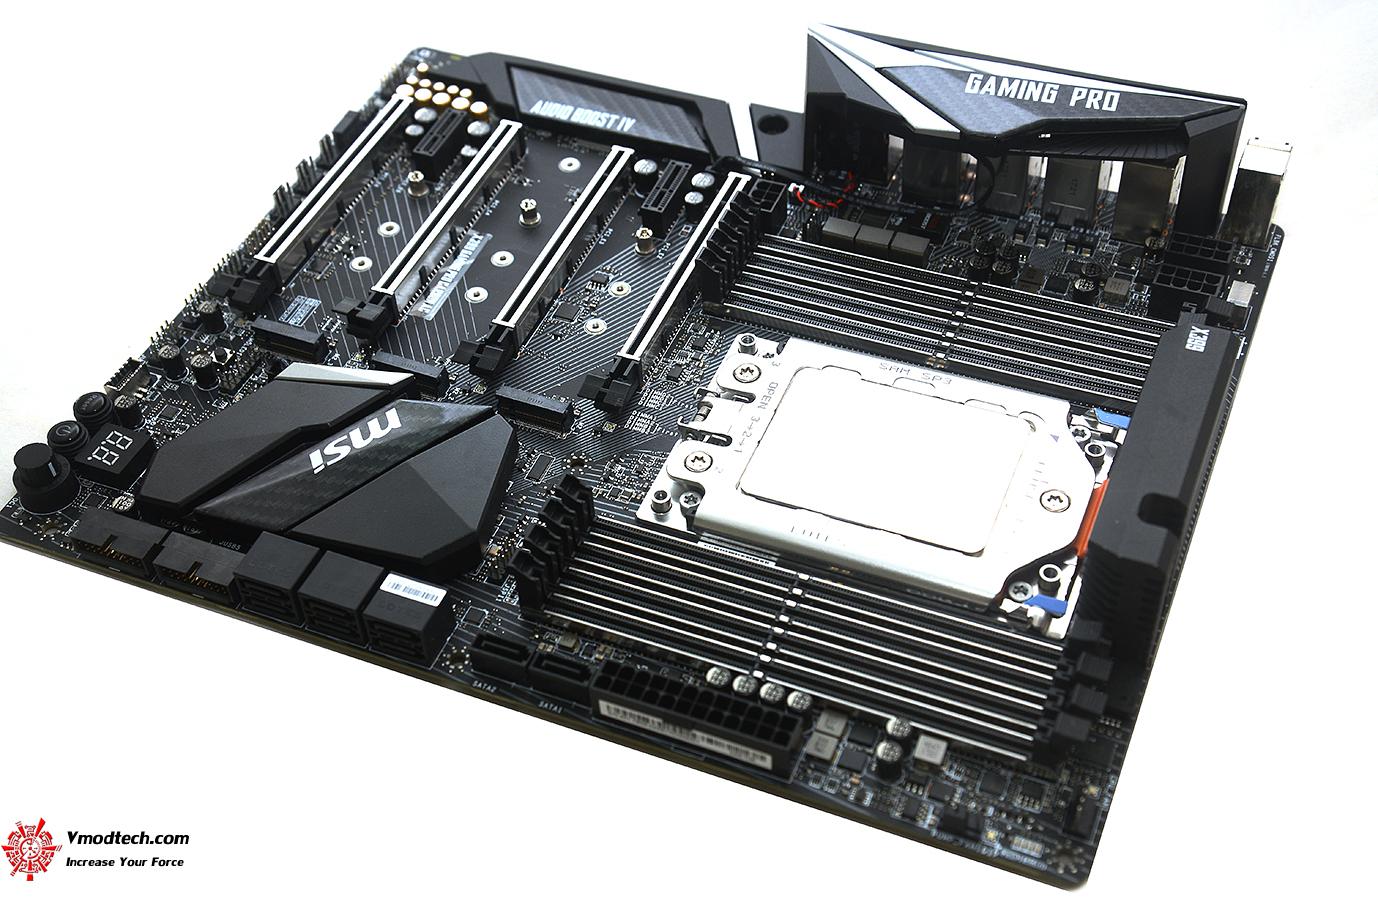 dsc 0552 AMD RYZEN THREADRIPPER 2920X PROCESSOR REVIEW